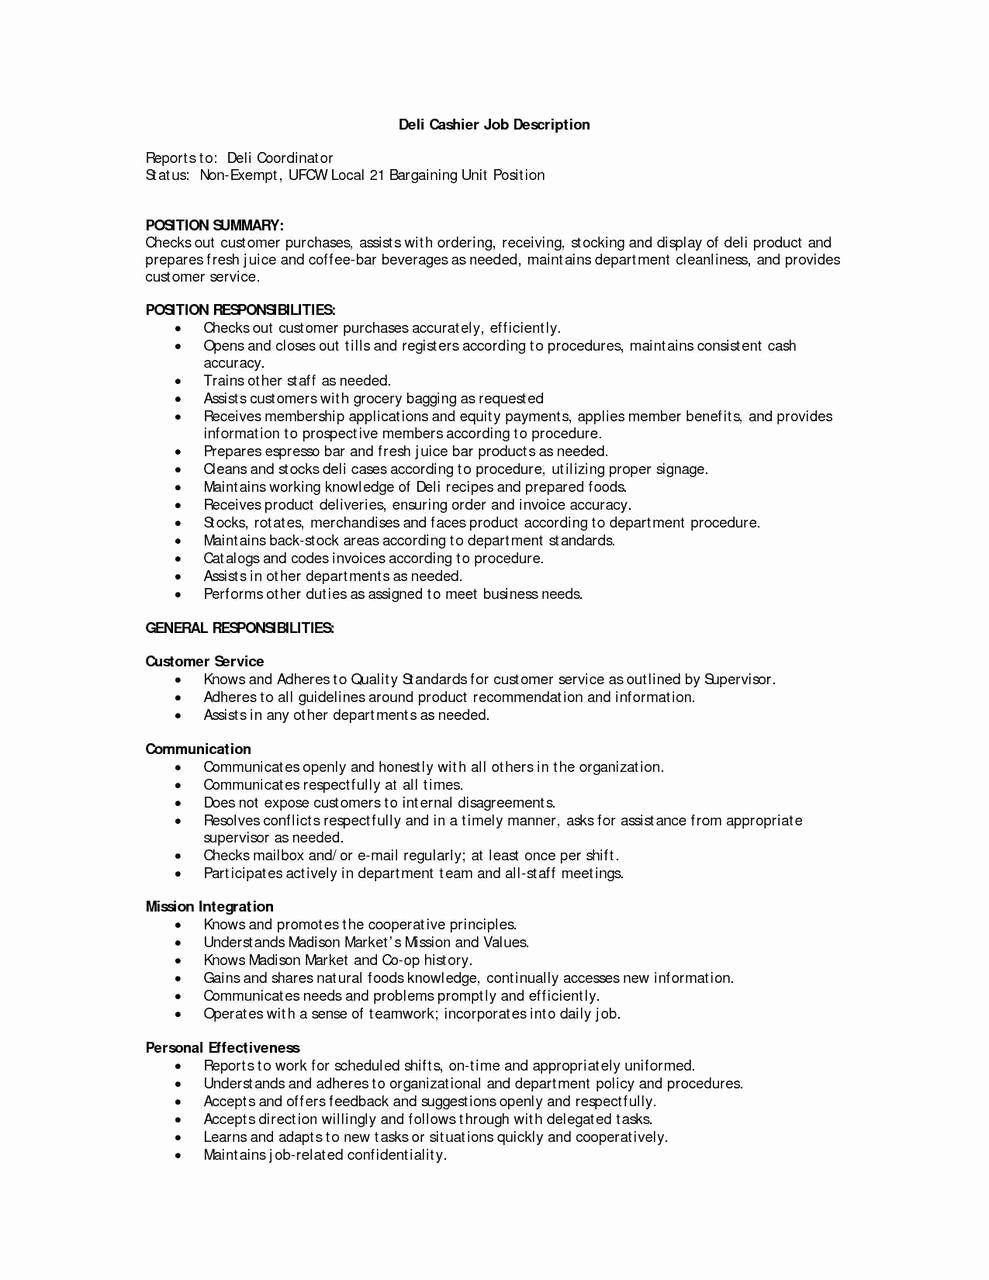 Food Service Worker Job Description Resume Fresh 73 Beautiful Resume Sample For Cashier In Fast Food Resu Customer Service Resume Job Description Server Resume